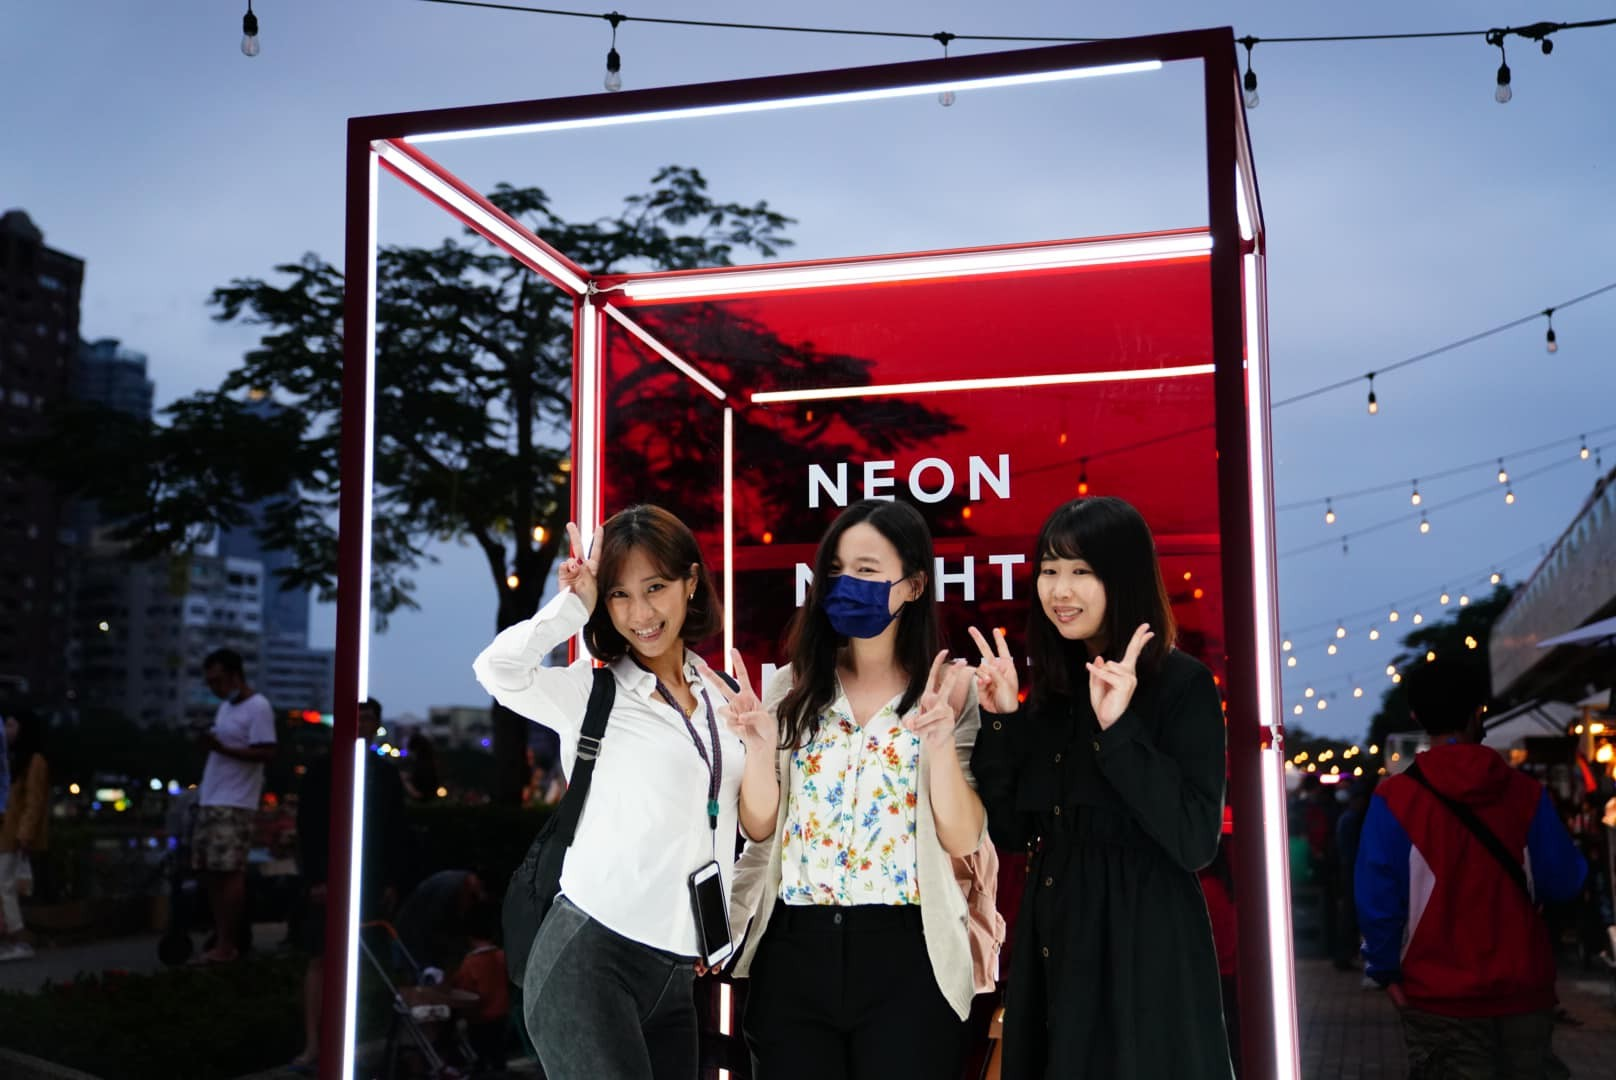 NEON MARKET – 霓虹派對1.0